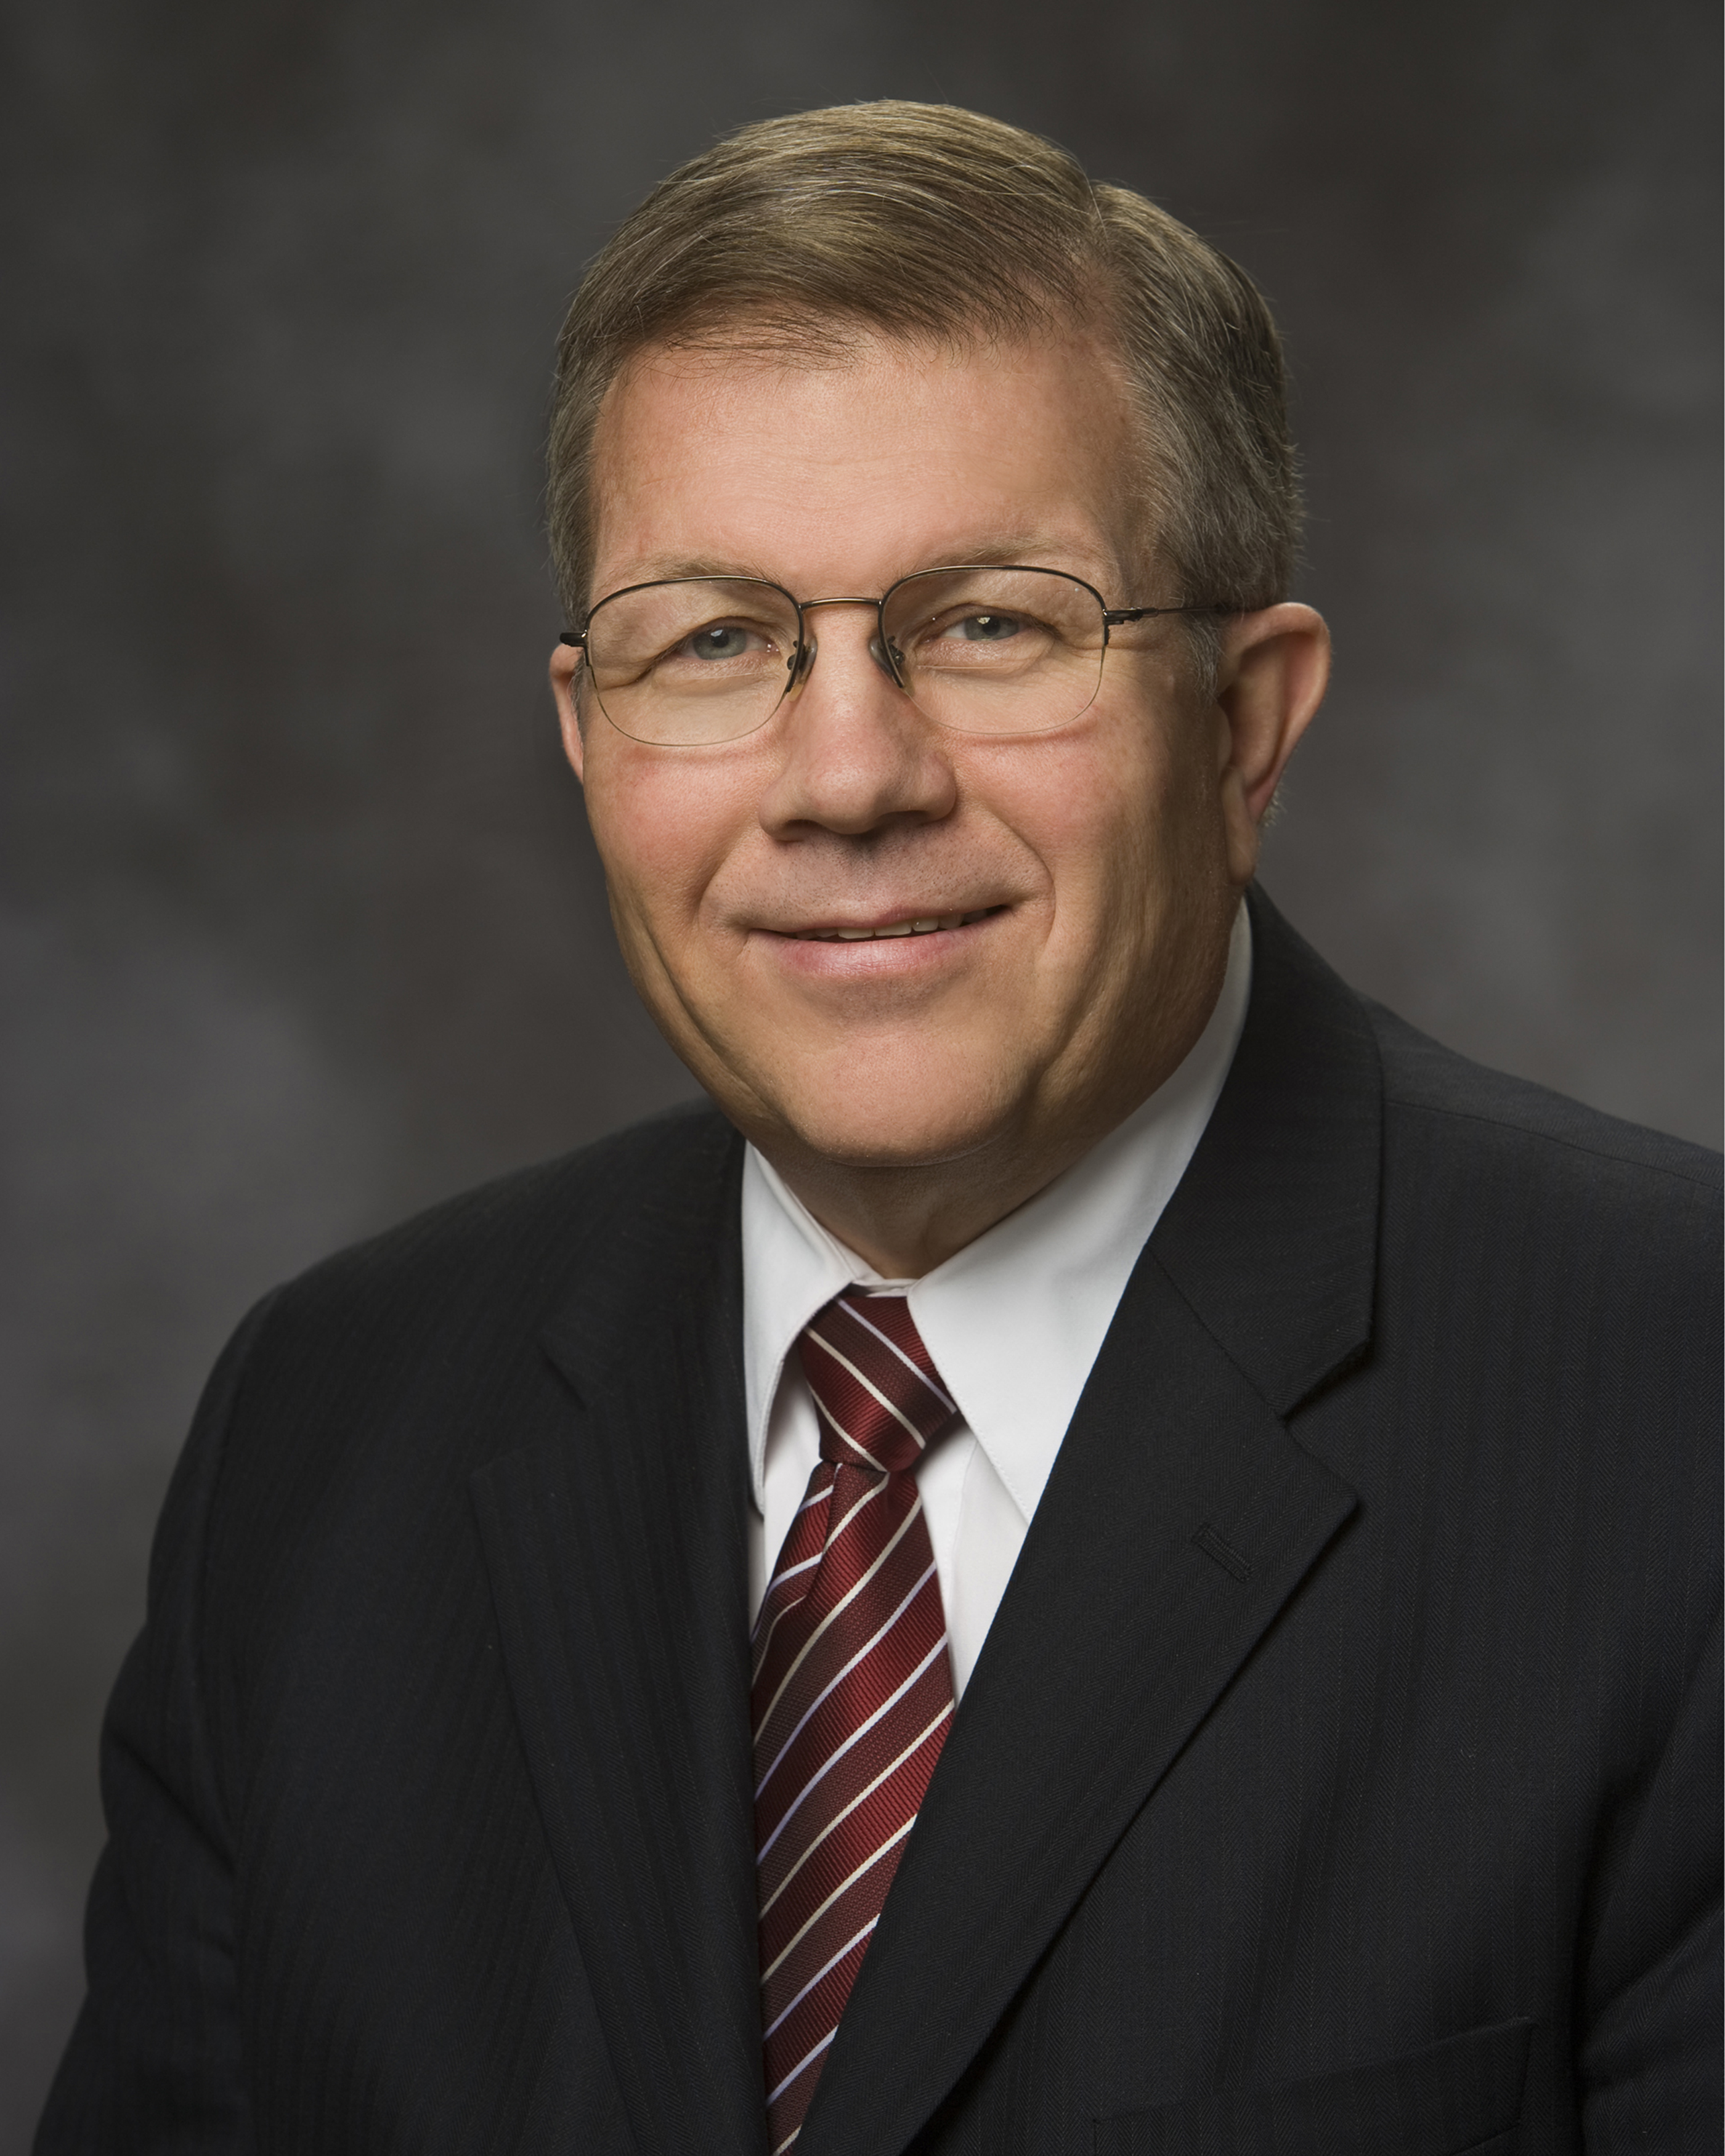 Elder Allan F. Packer, emeritus General Authority Seventy